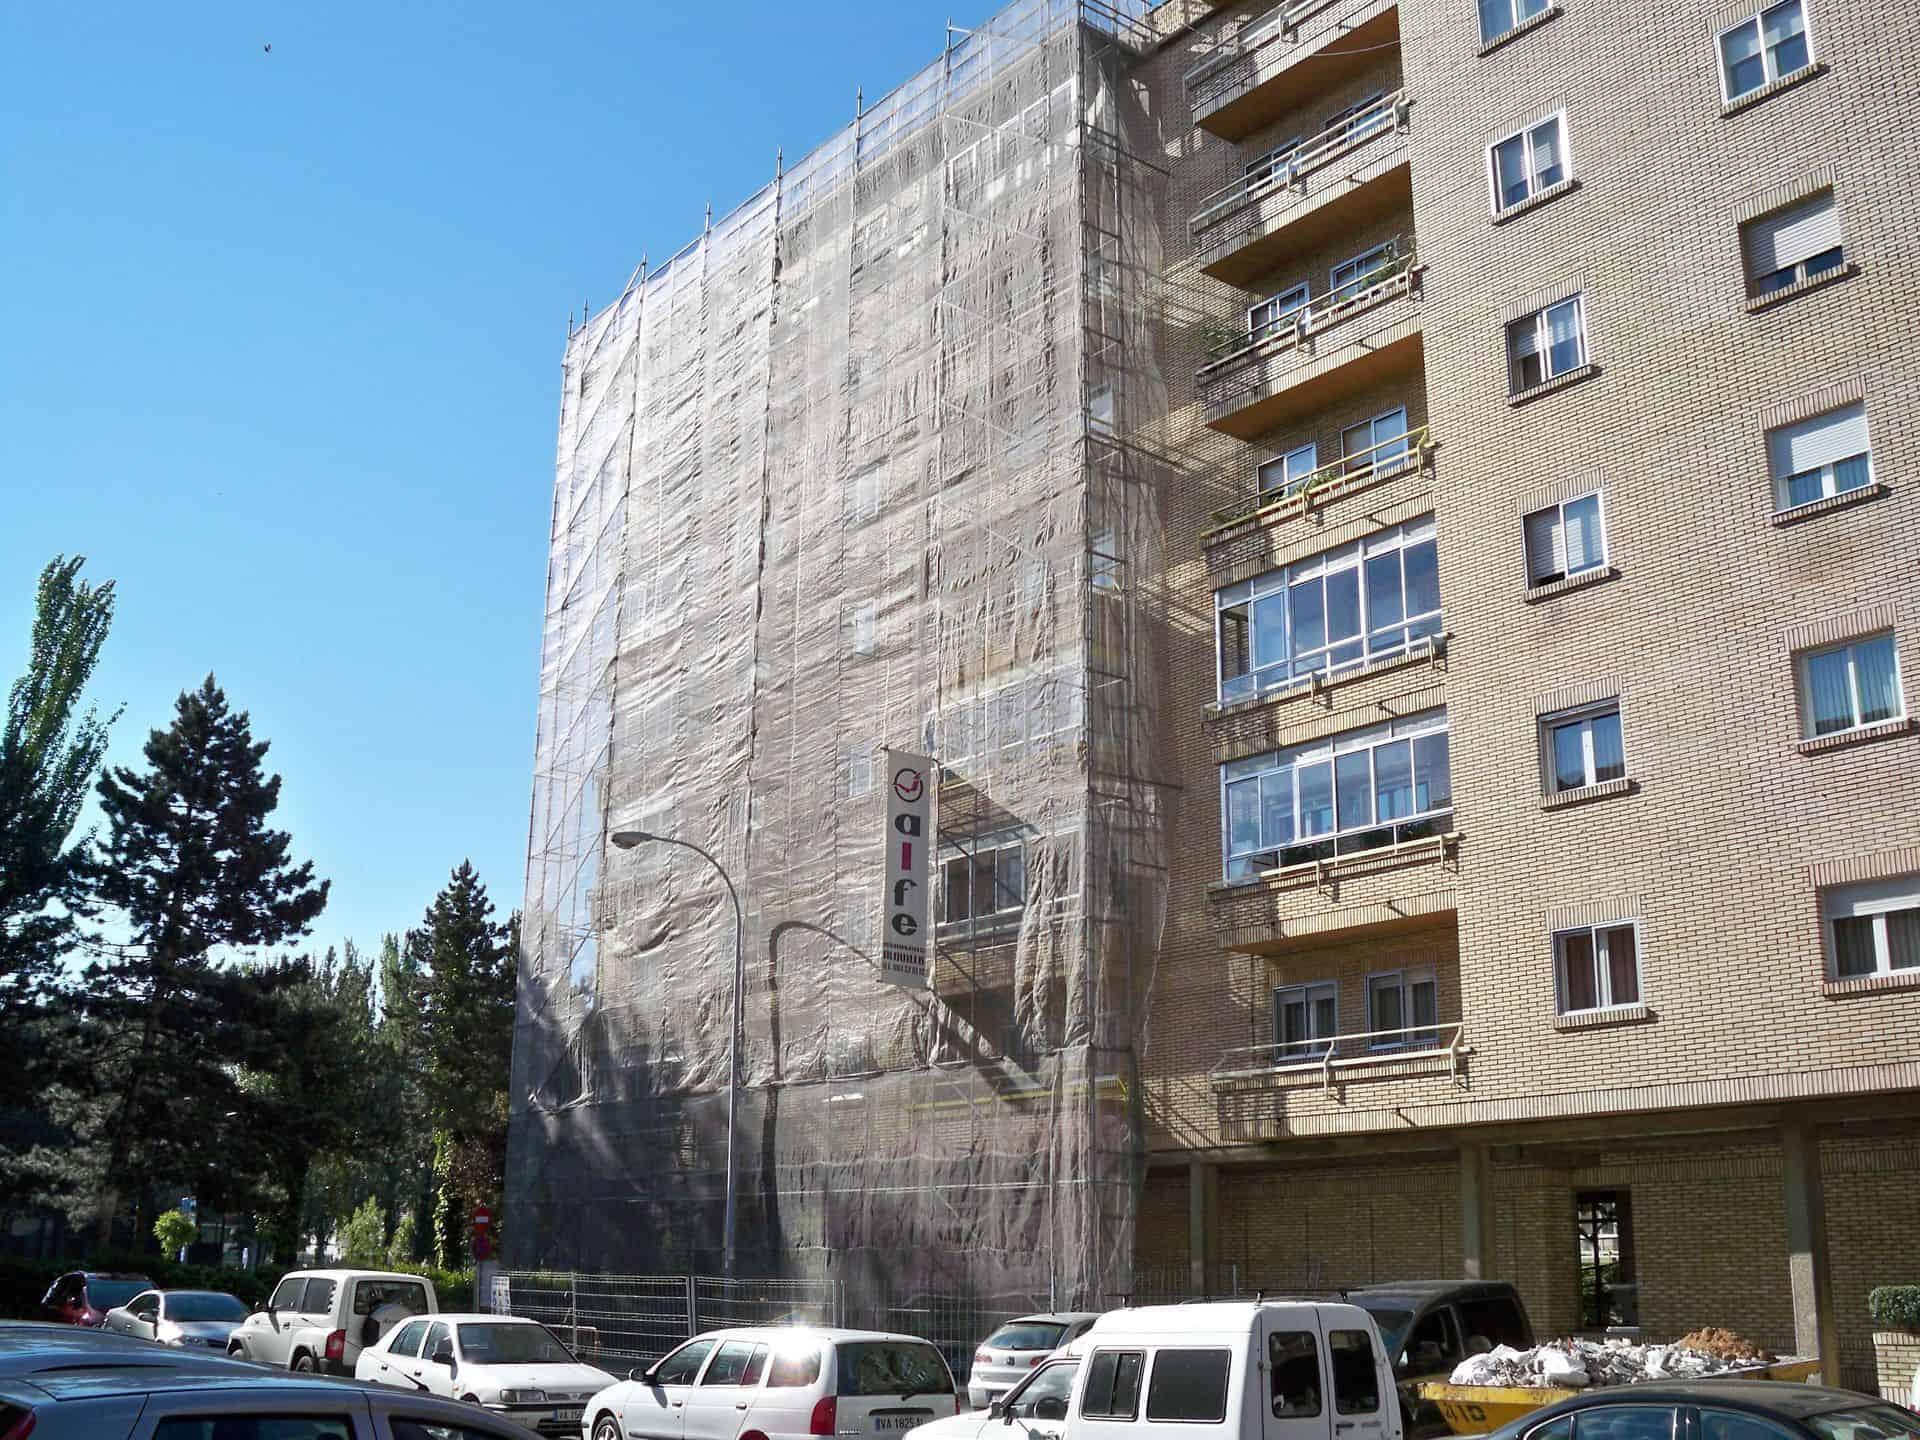 andamio-rehabilitacion-fachada-viviendas-